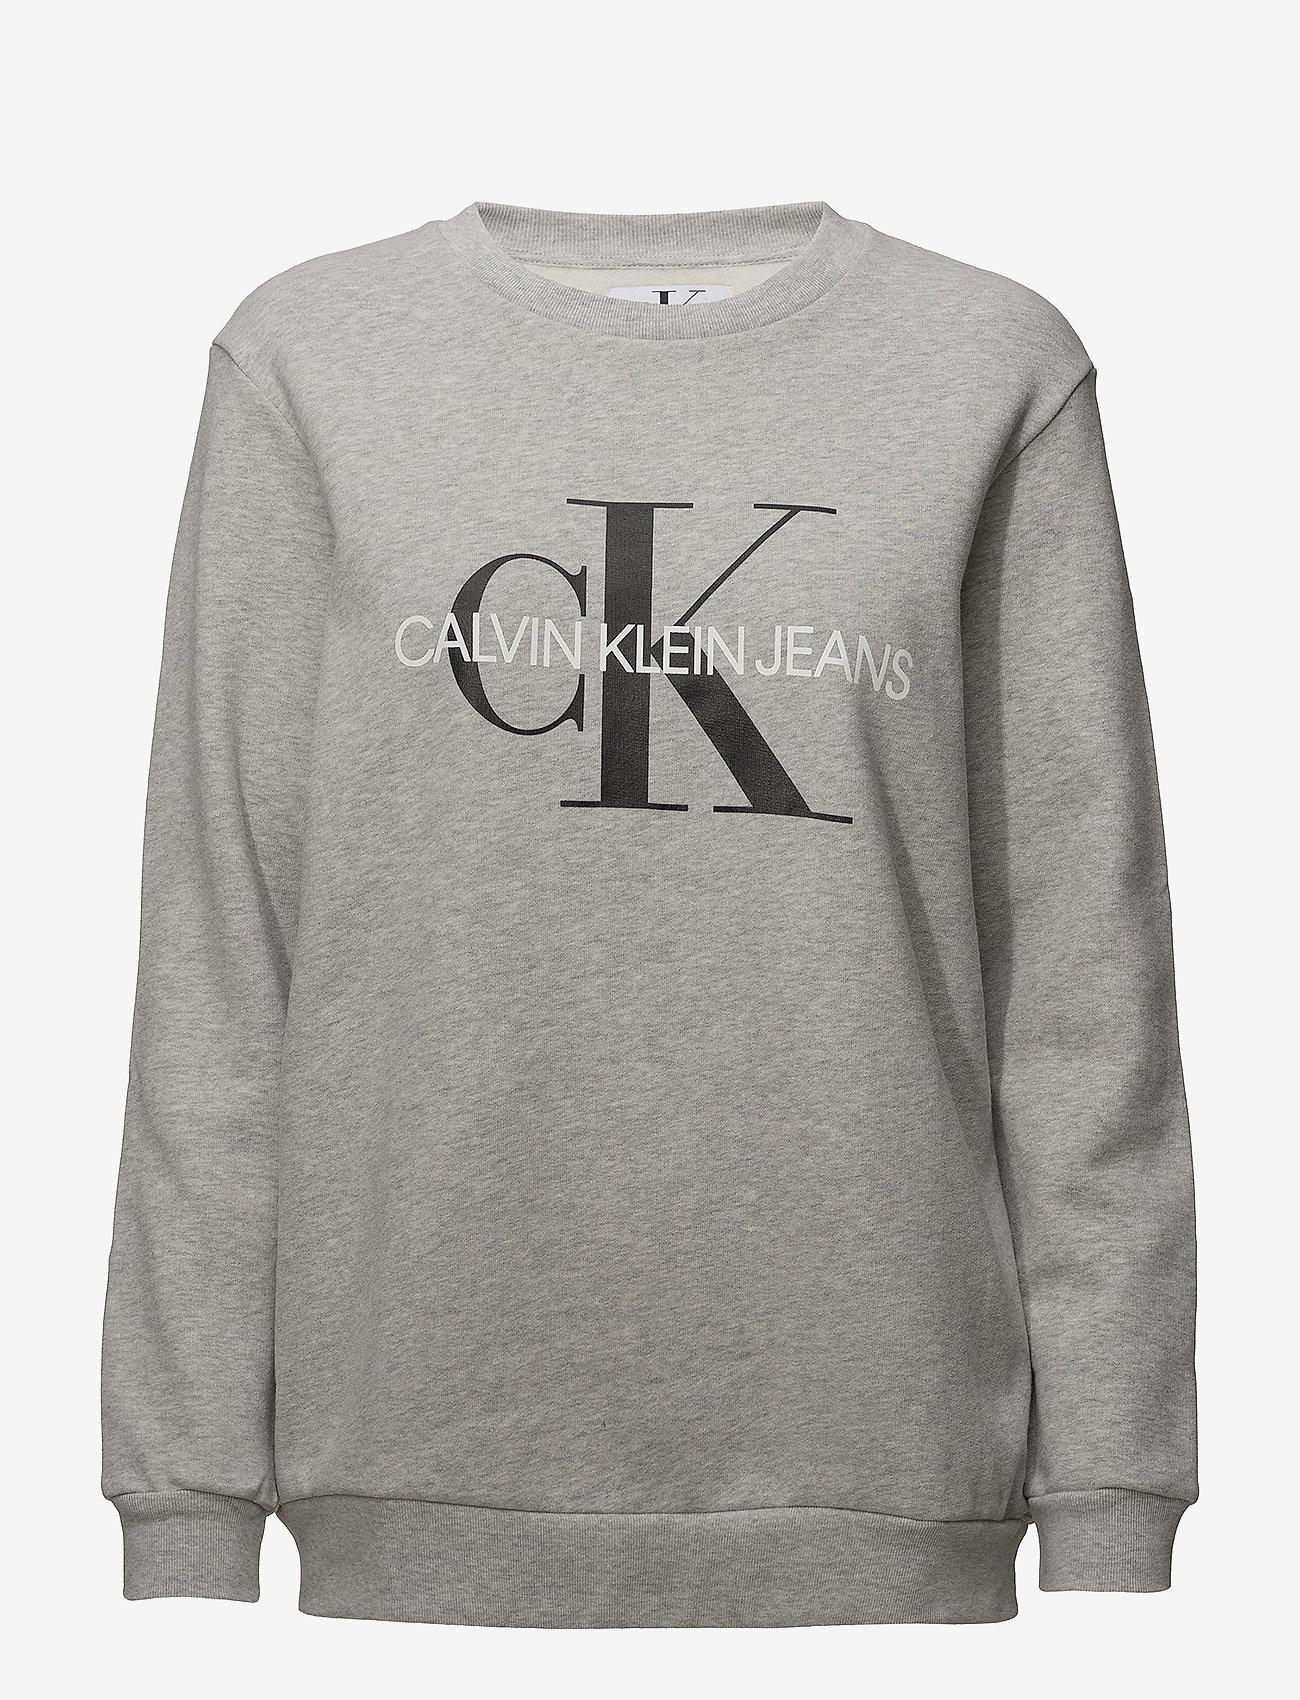 Calvin Klein Jeans - CORE MONOGRAM LOGO SWEATSHIRT - sweatshirts - light grey heather - 0